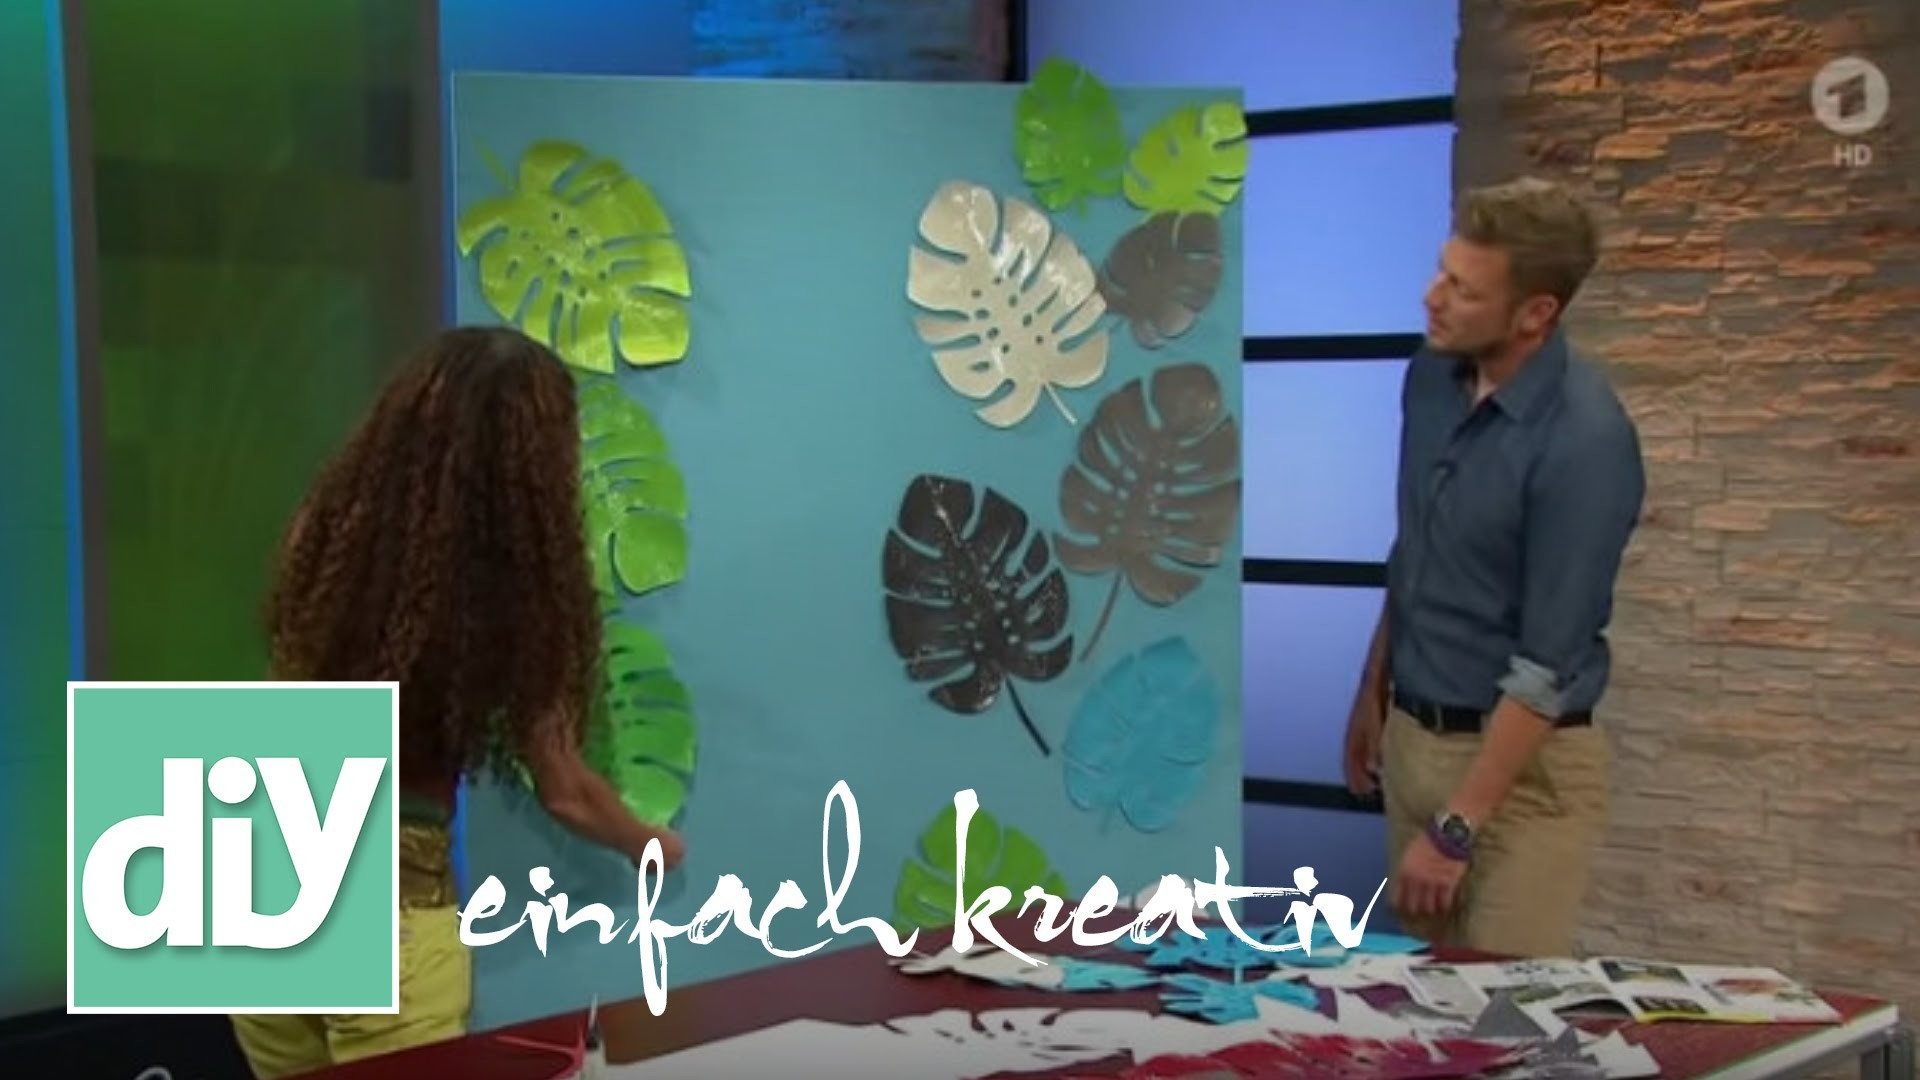 Wanddekoration 3D-Blatt | DIY einfach kreativ